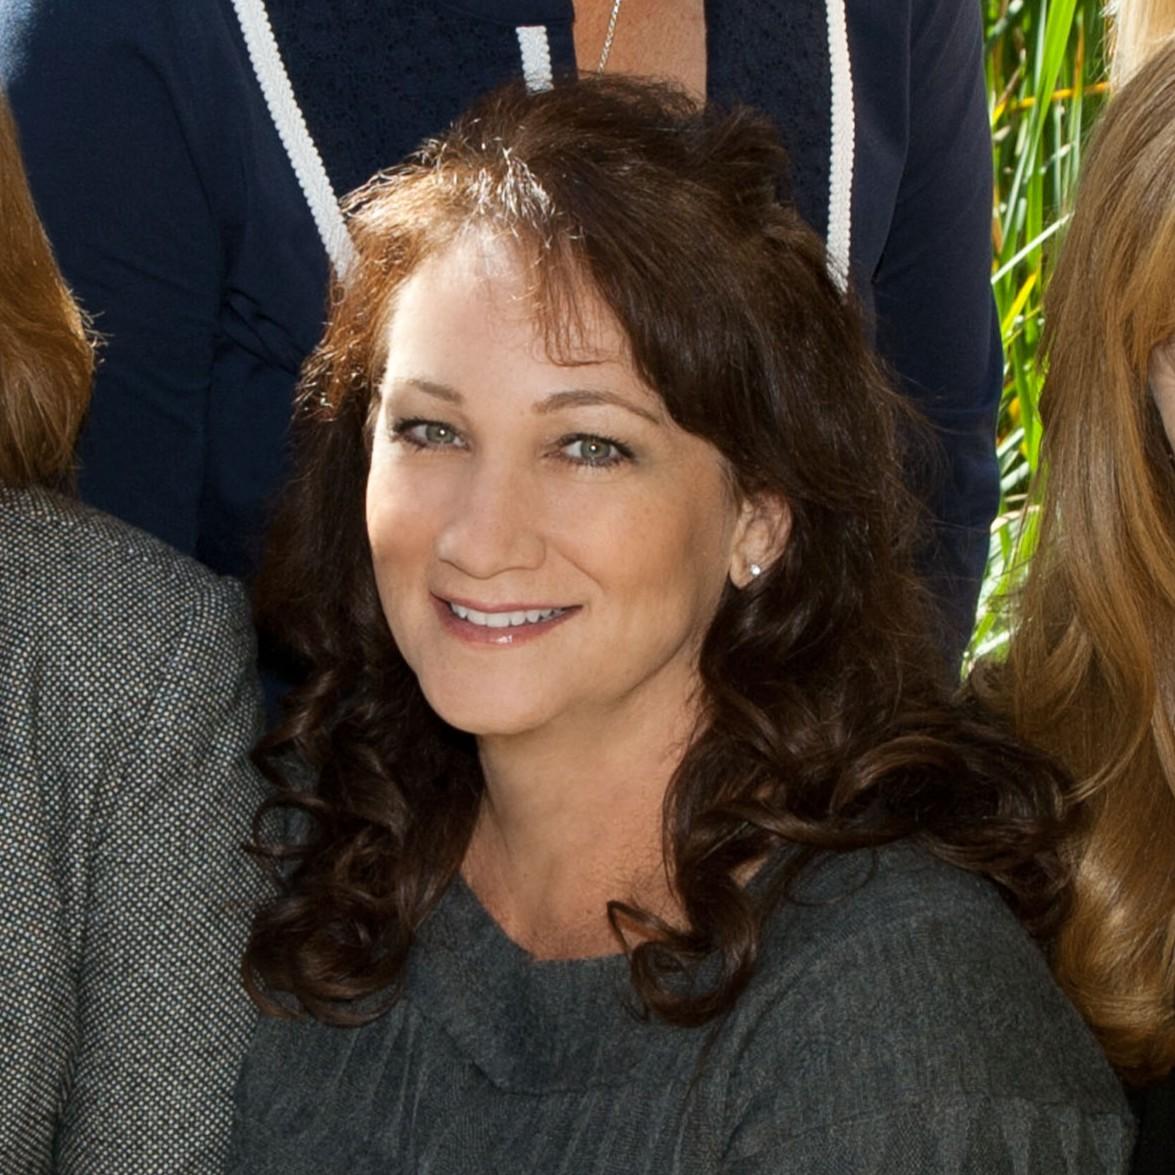 Boise Trauma Counselor